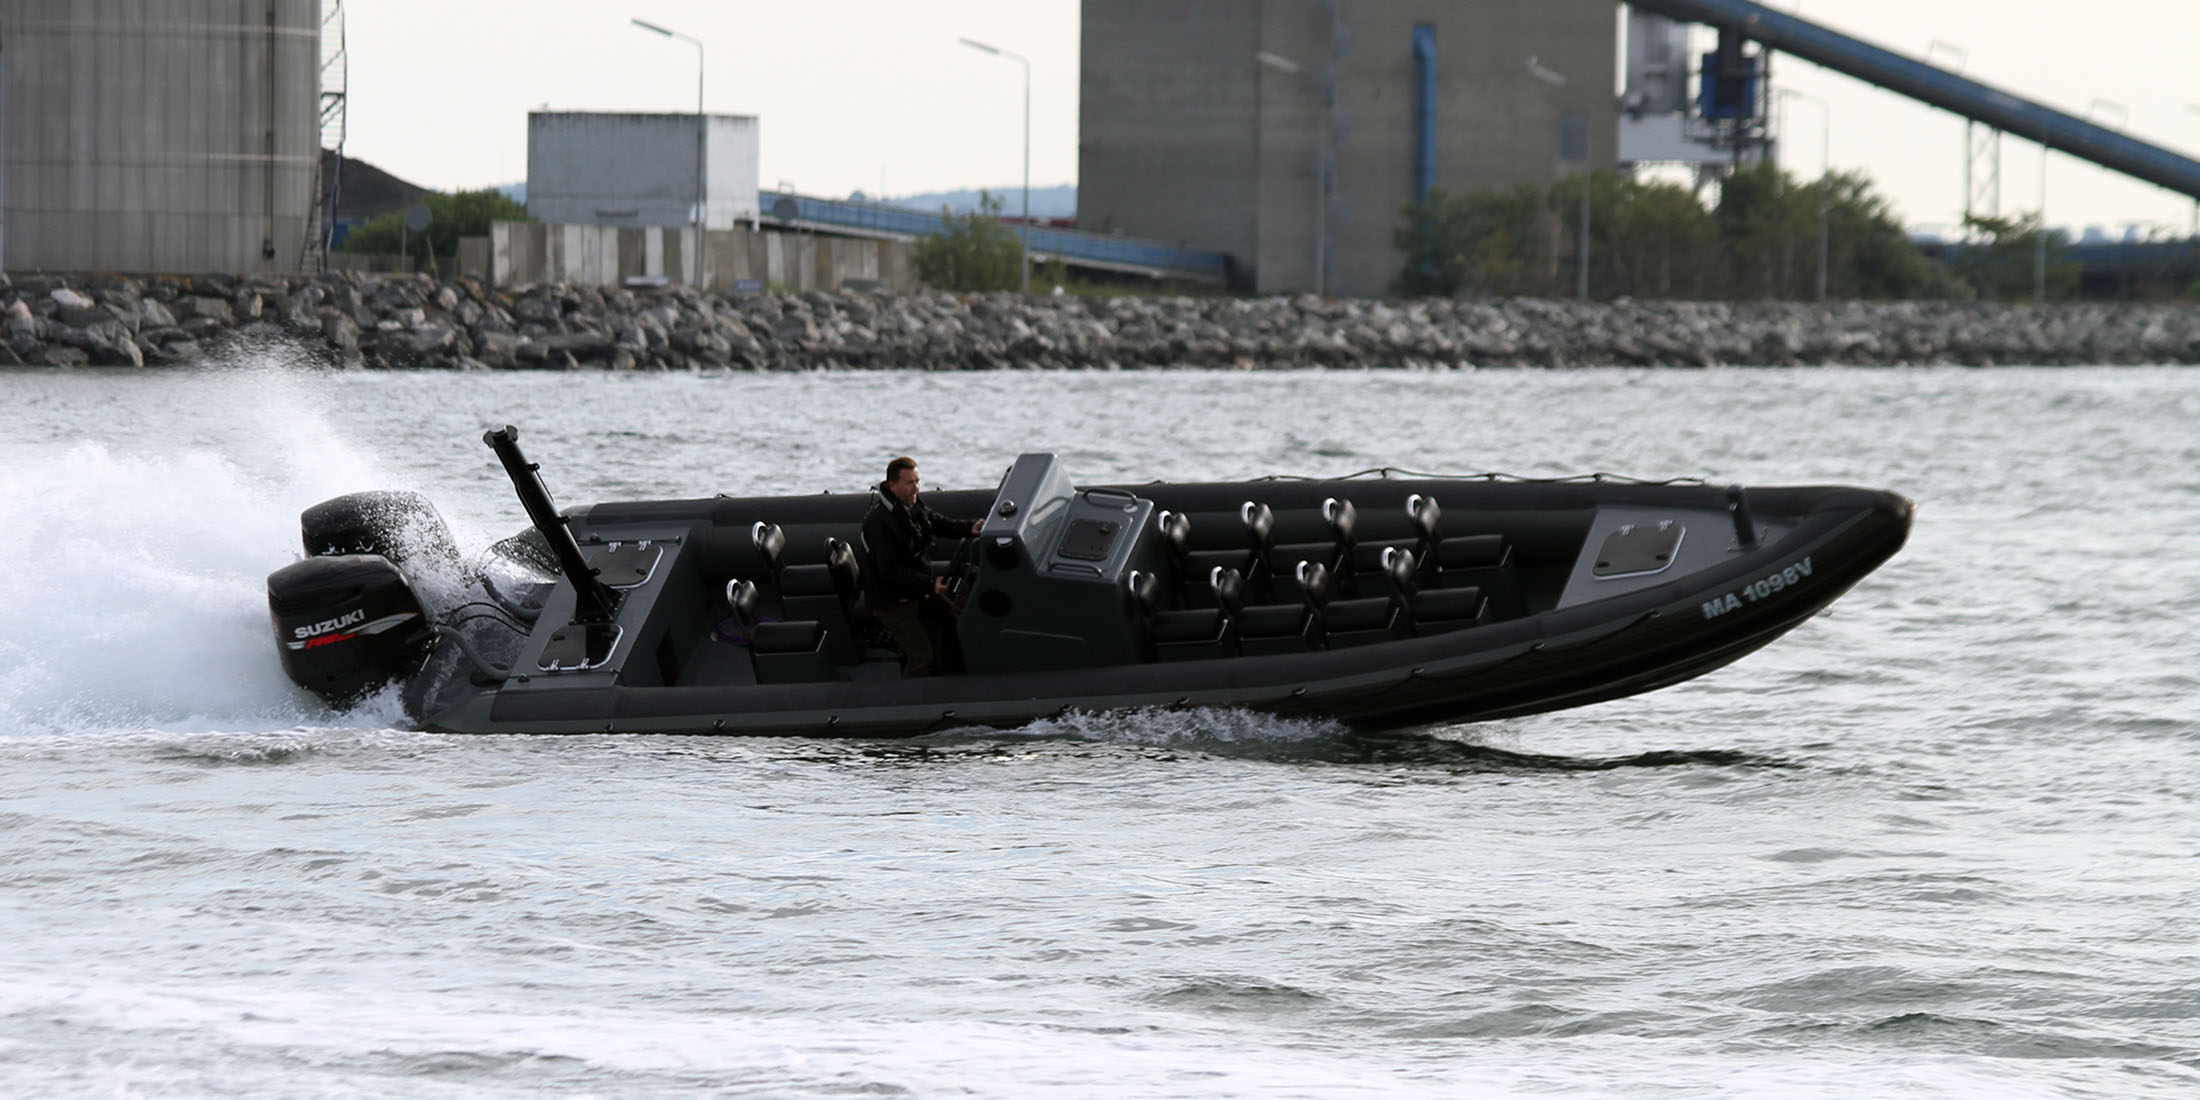 Tornado 9.5m High Performance RIB. Great as a event and seafari boat